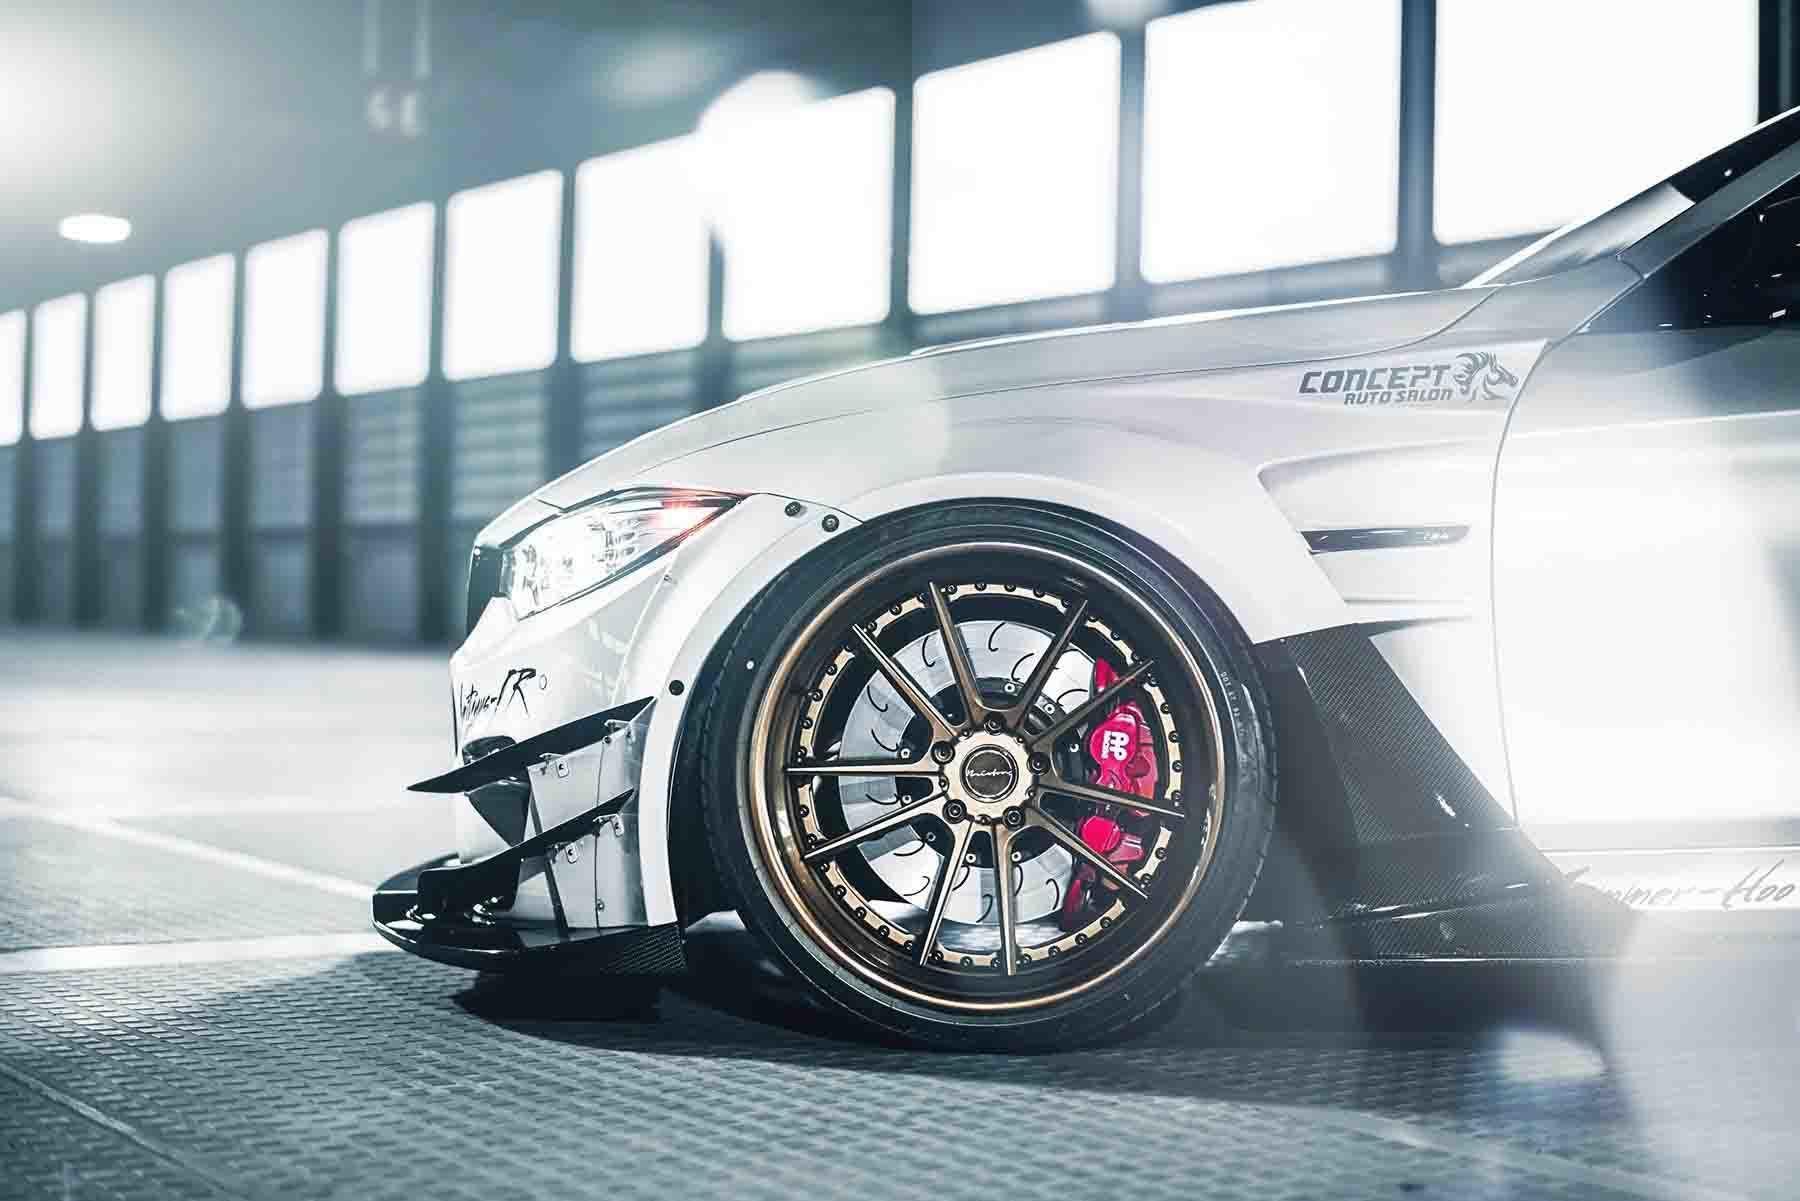 images-products-1-2179-232974467-brixton-forged-m51-targa-series-forged-wheels-varis-bmw-f82-m4-white-bronze-wheels-1800x1201.jpg